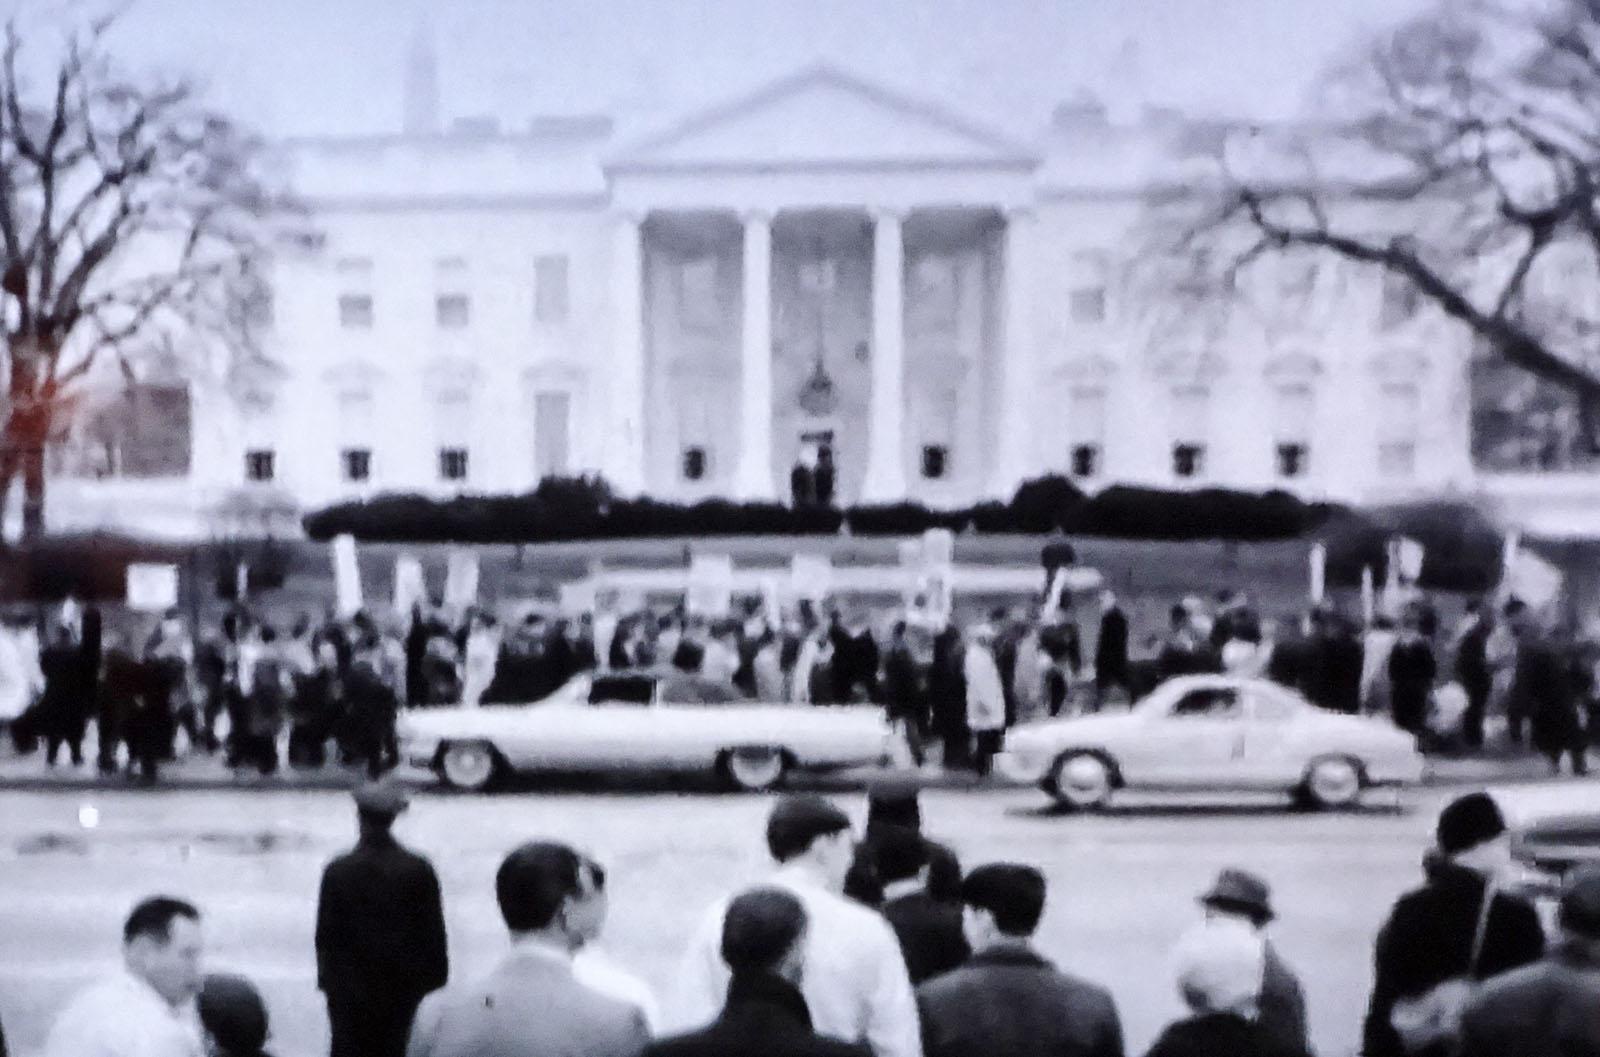 Karmann Ghia in PBS documentary